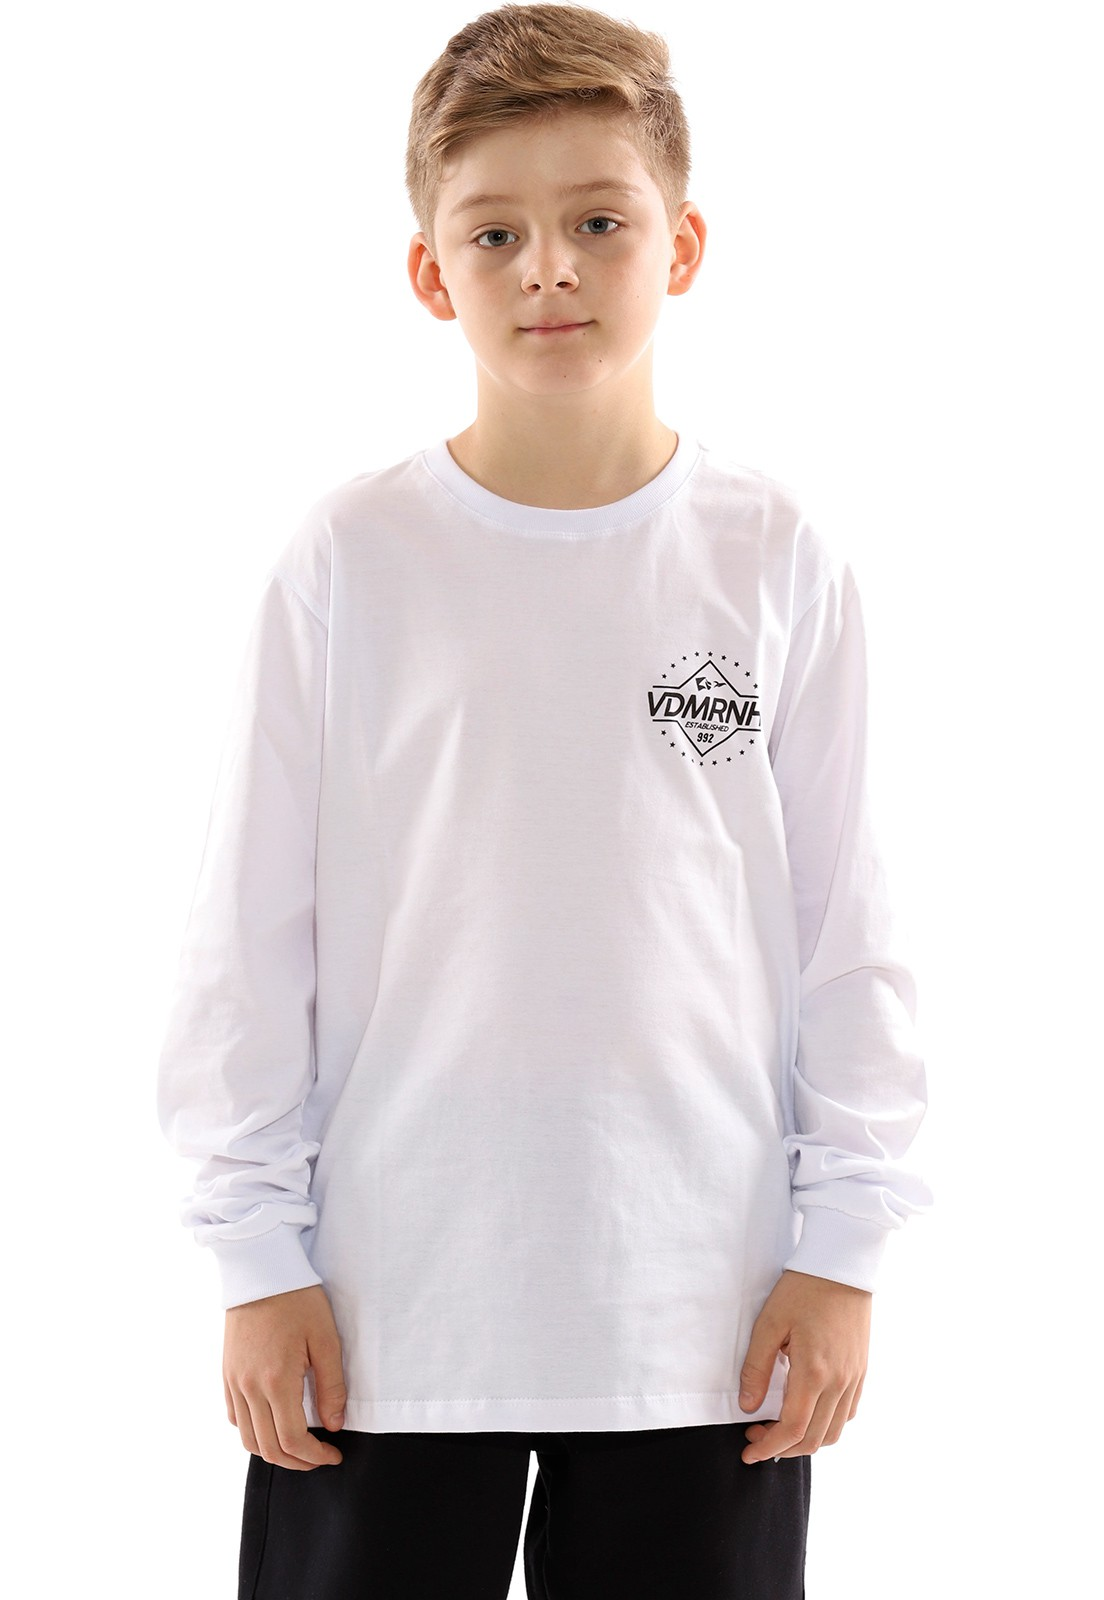 Camiseta Vida Marinha Manga Longa Branco